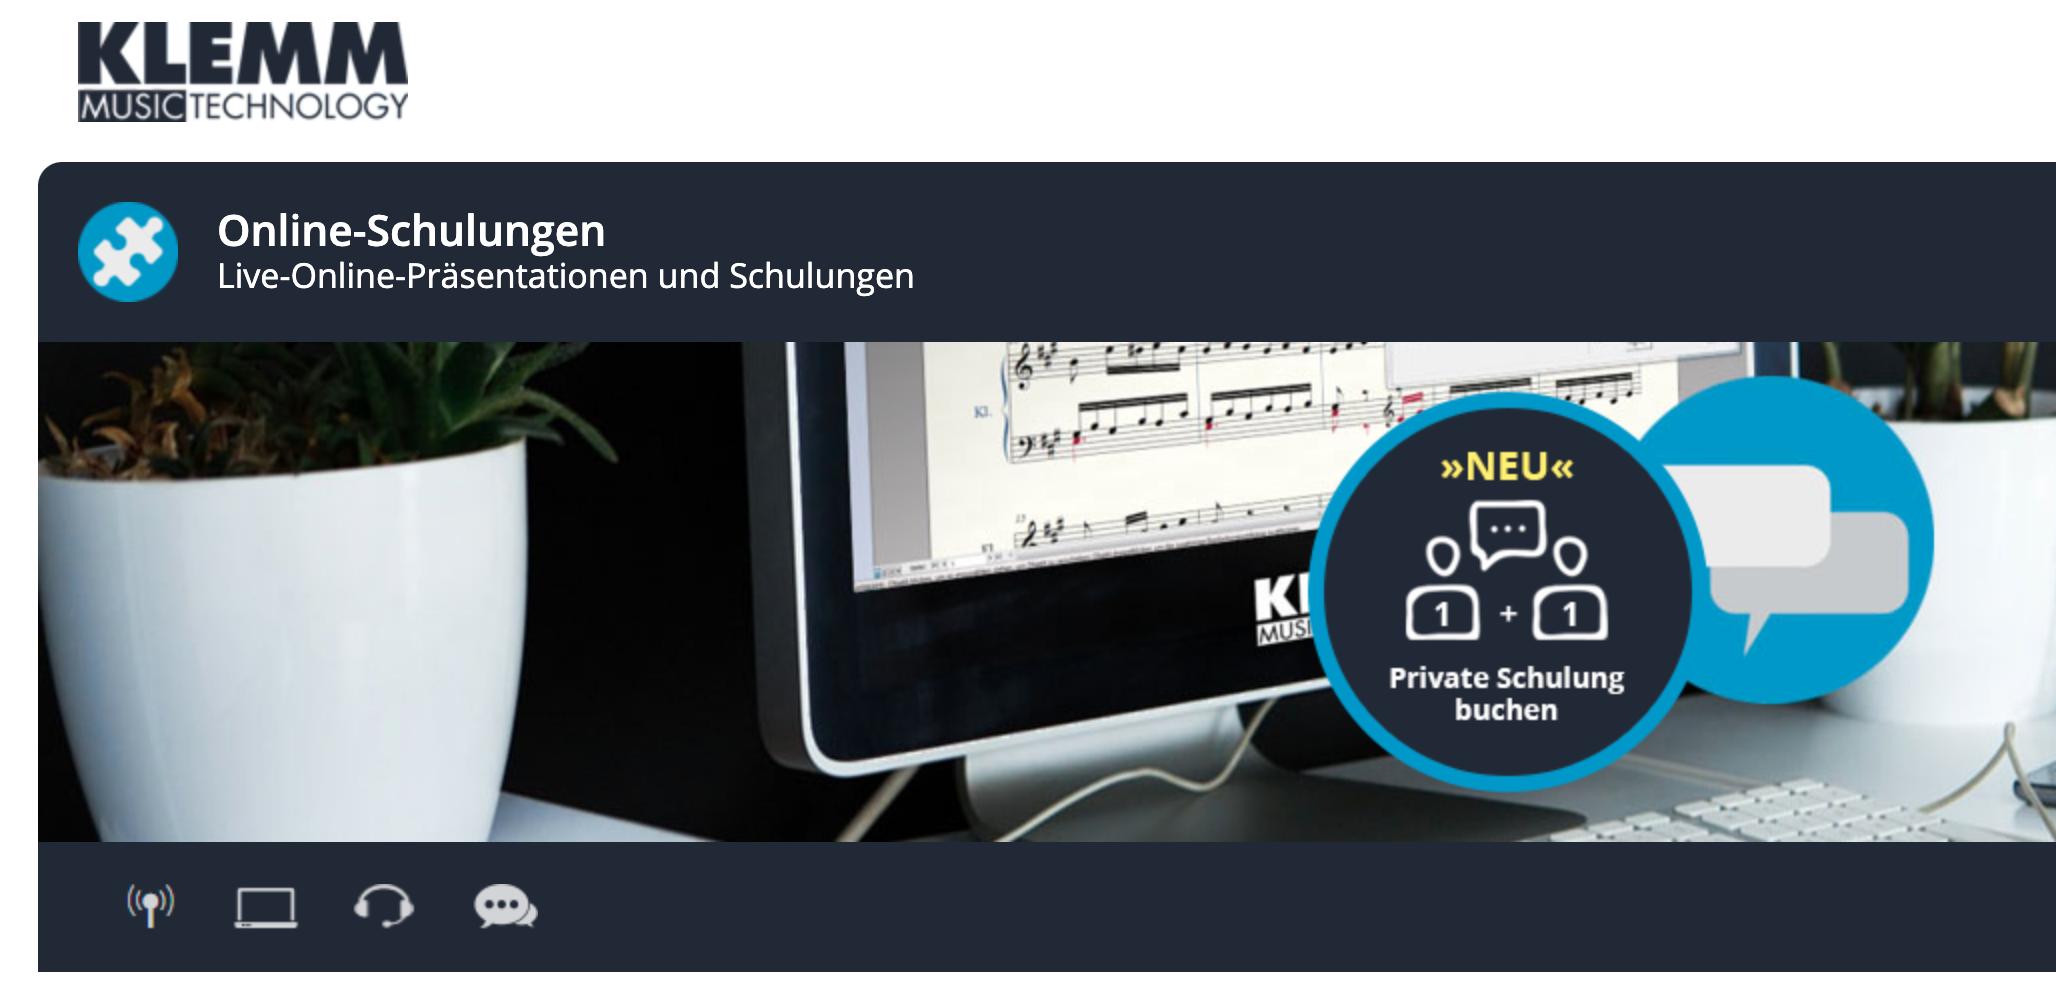 Webinare_Klemm Music Technology.png